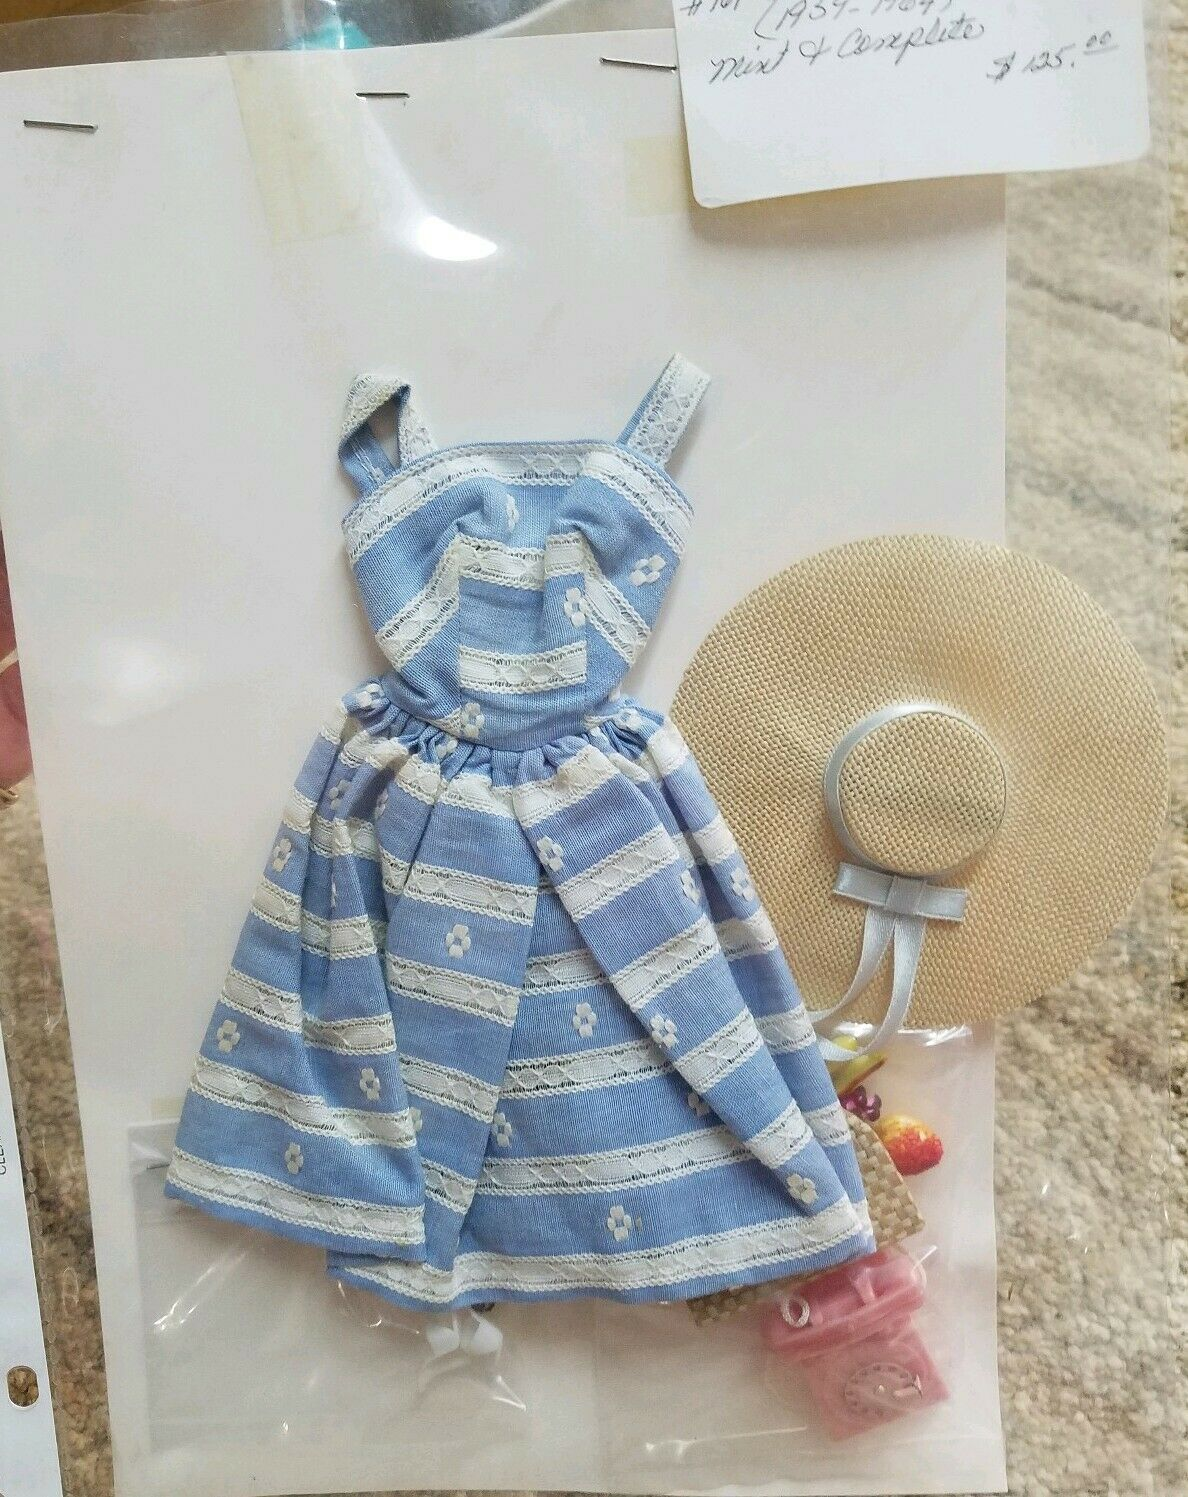 Barbie Vestido Original 1969 Suburban paso a paso como nuevo completo Sombrero Bolsa Zapatos de teléfono